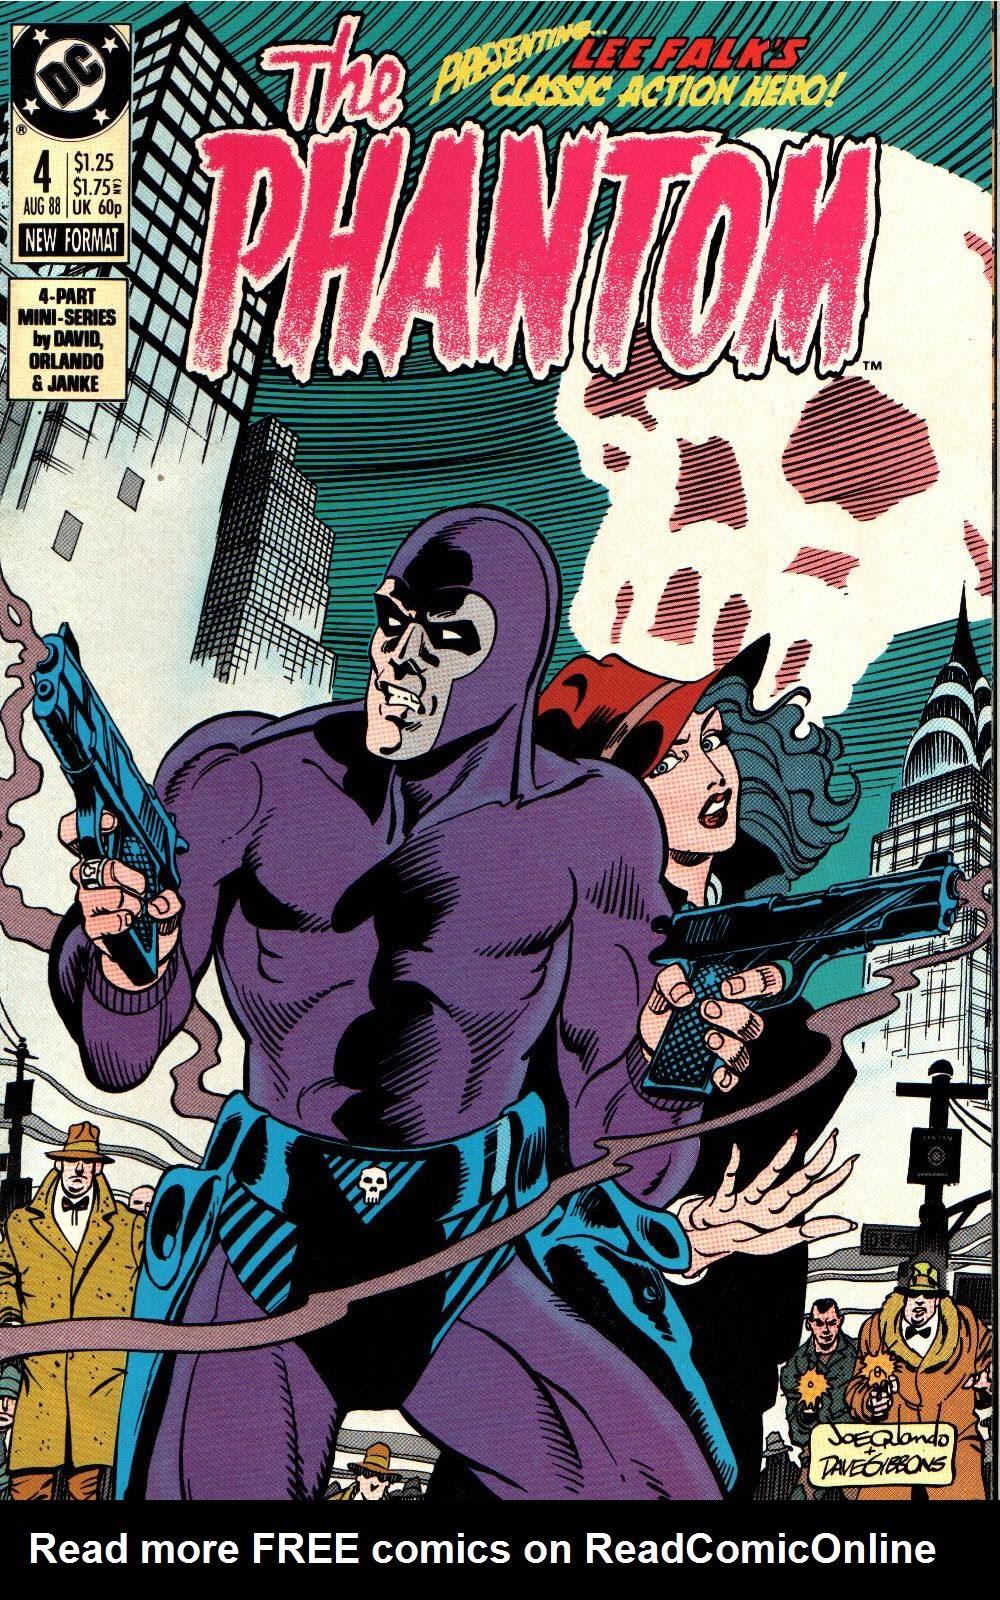 Read online The Phantom (1988) comic -  Issue #4 - 1